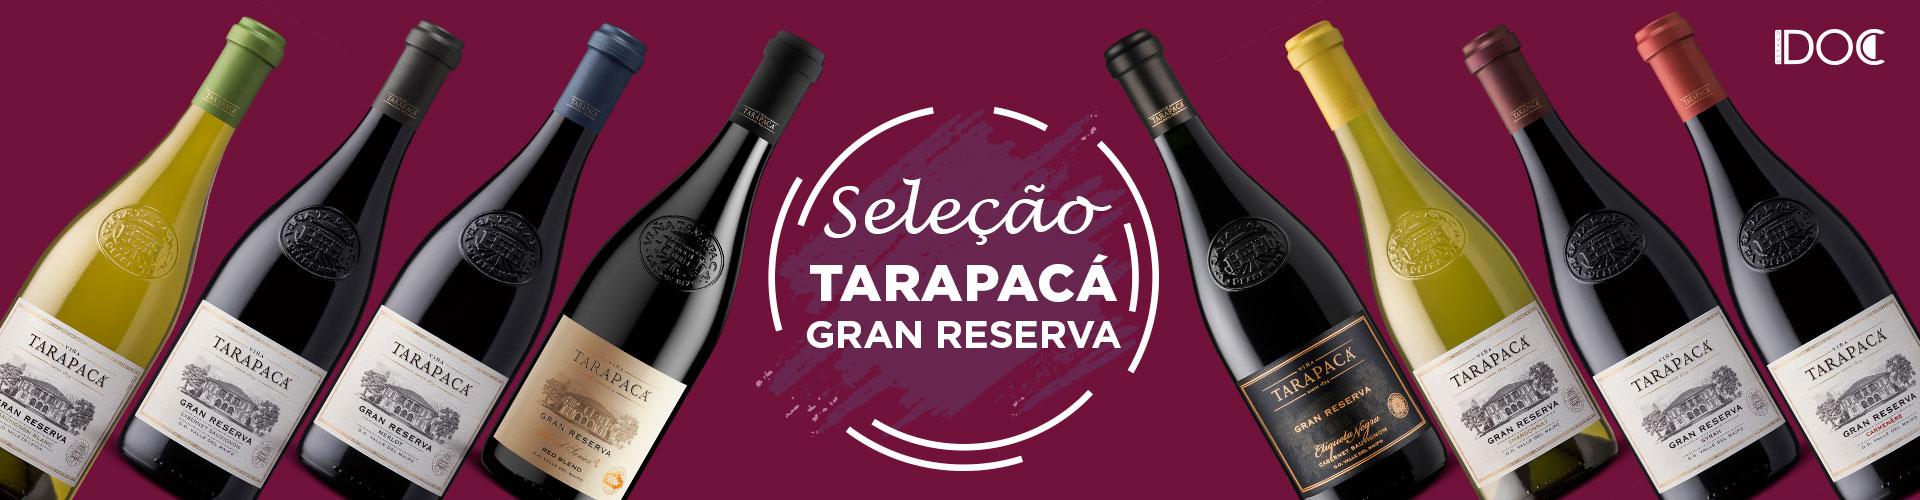 Seleção Gran Reserva Tarapacá